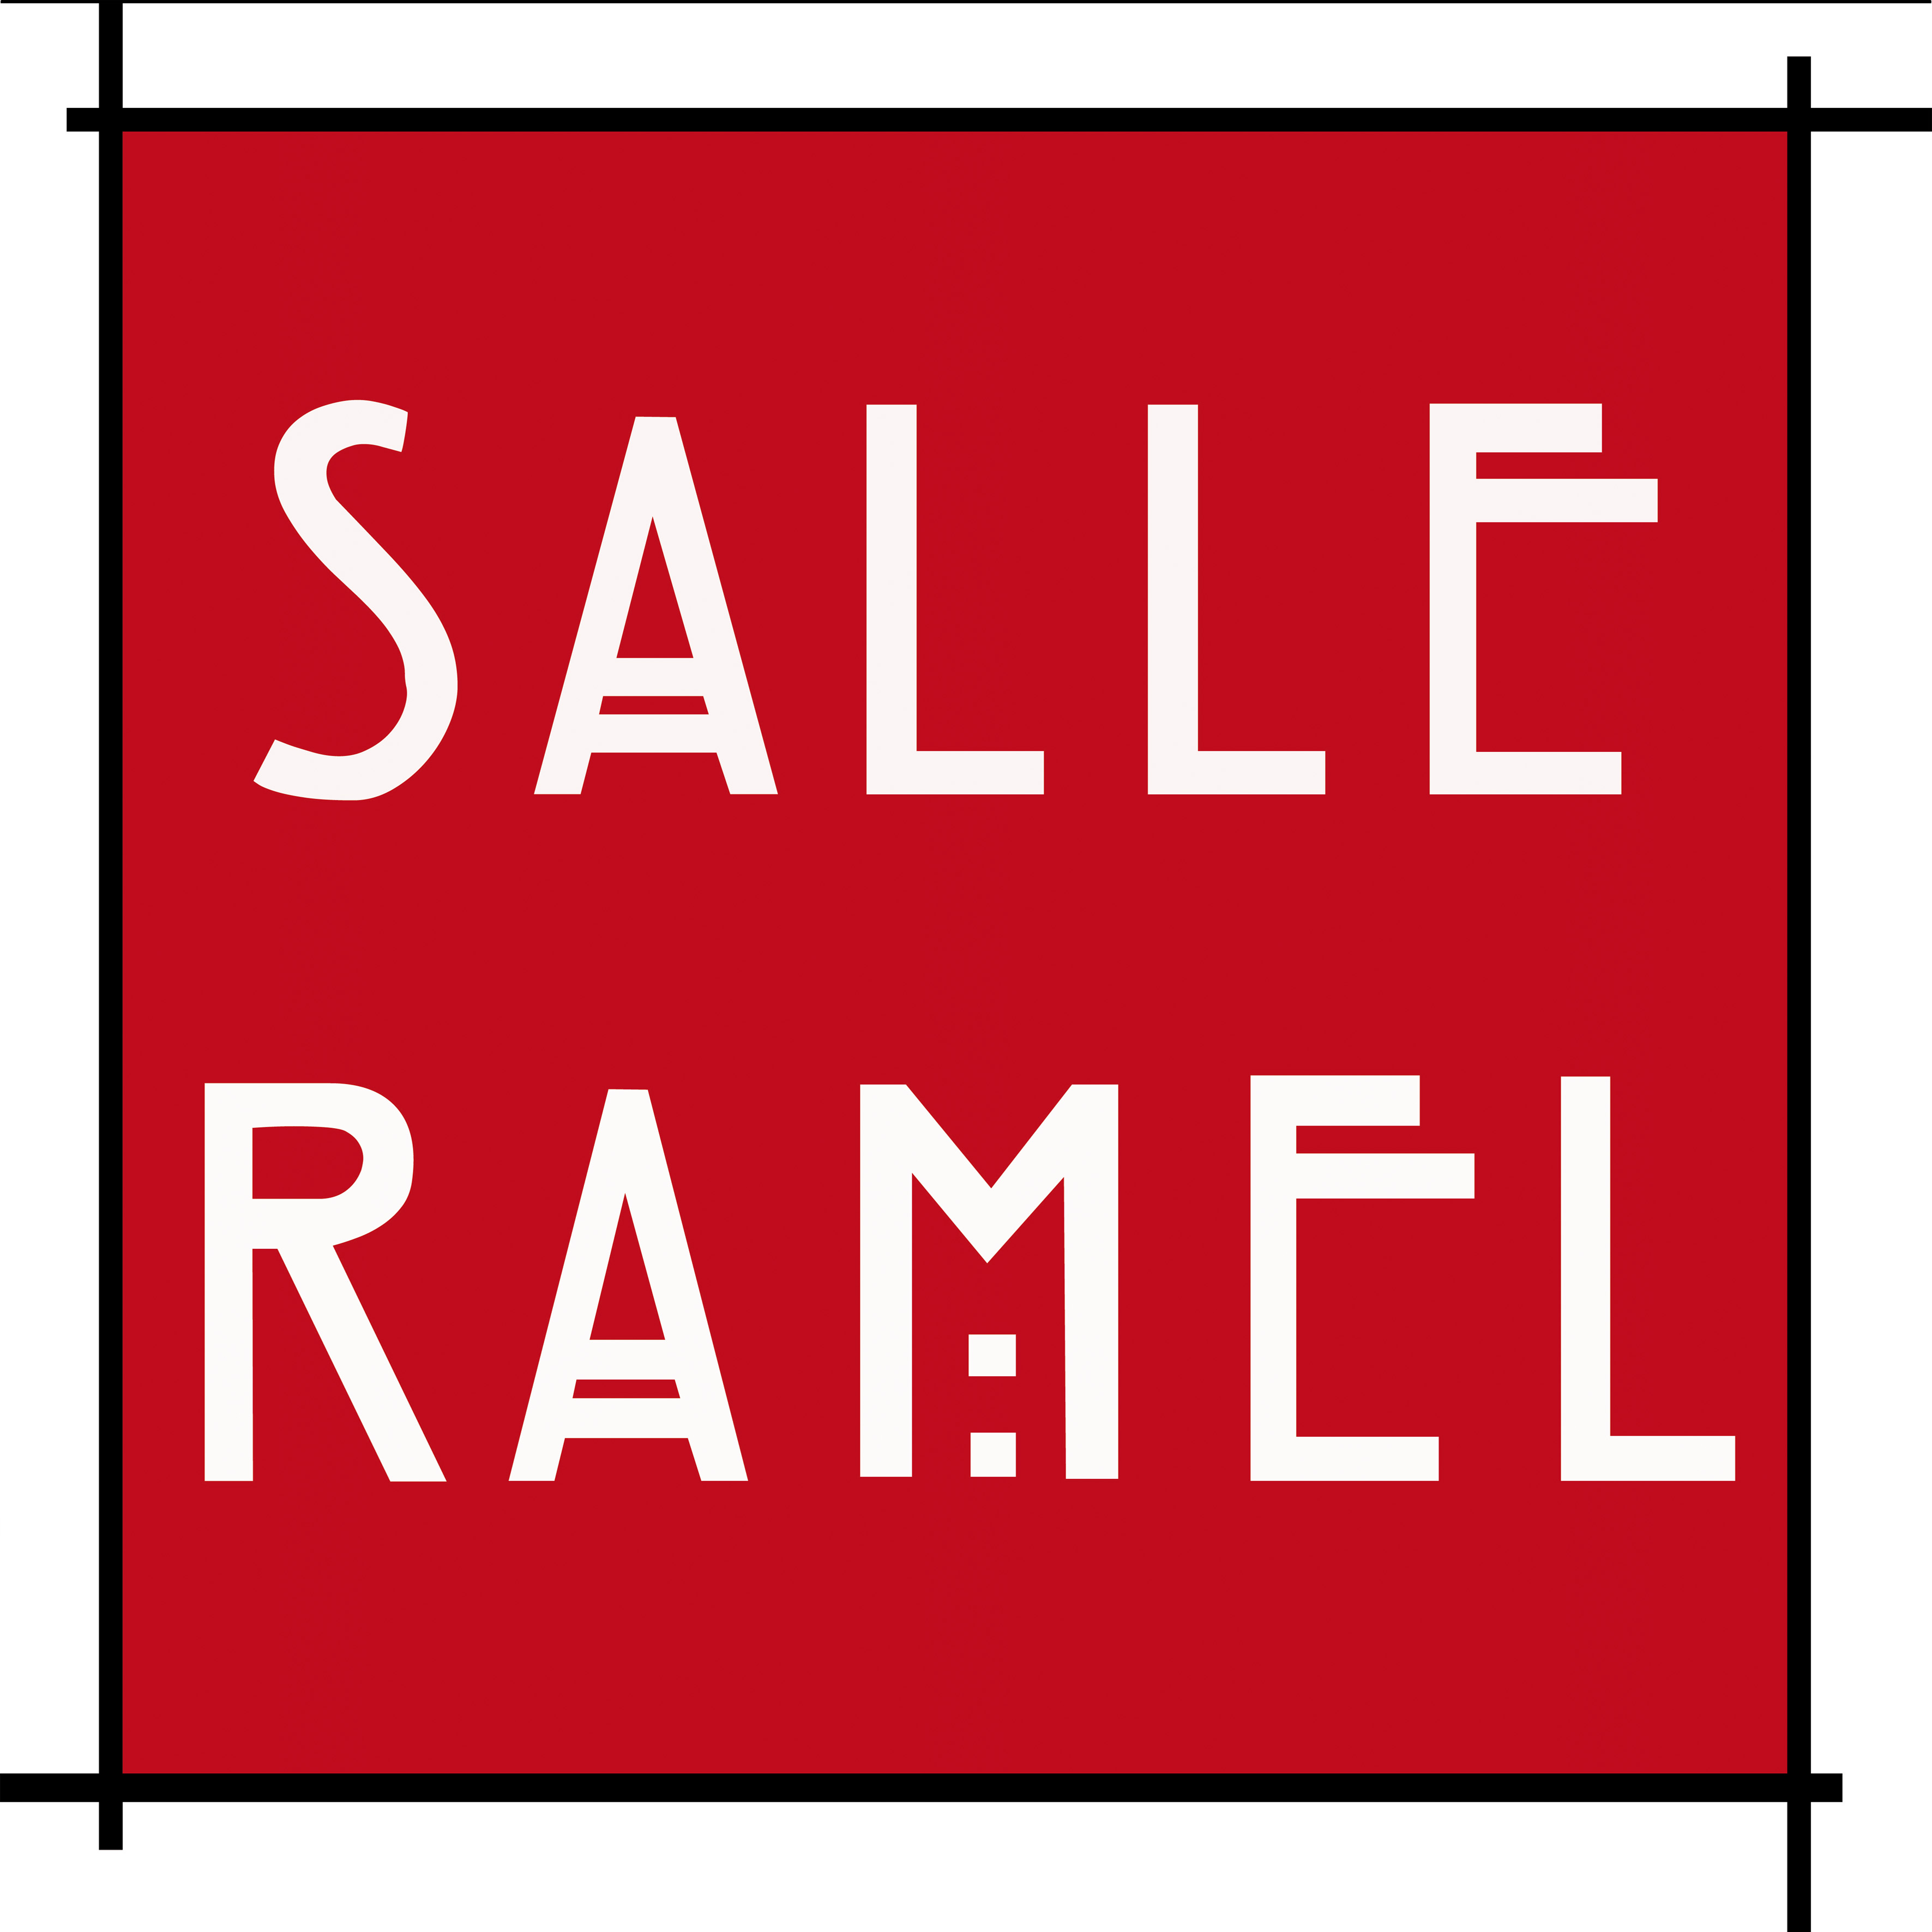 Salle RAMEL